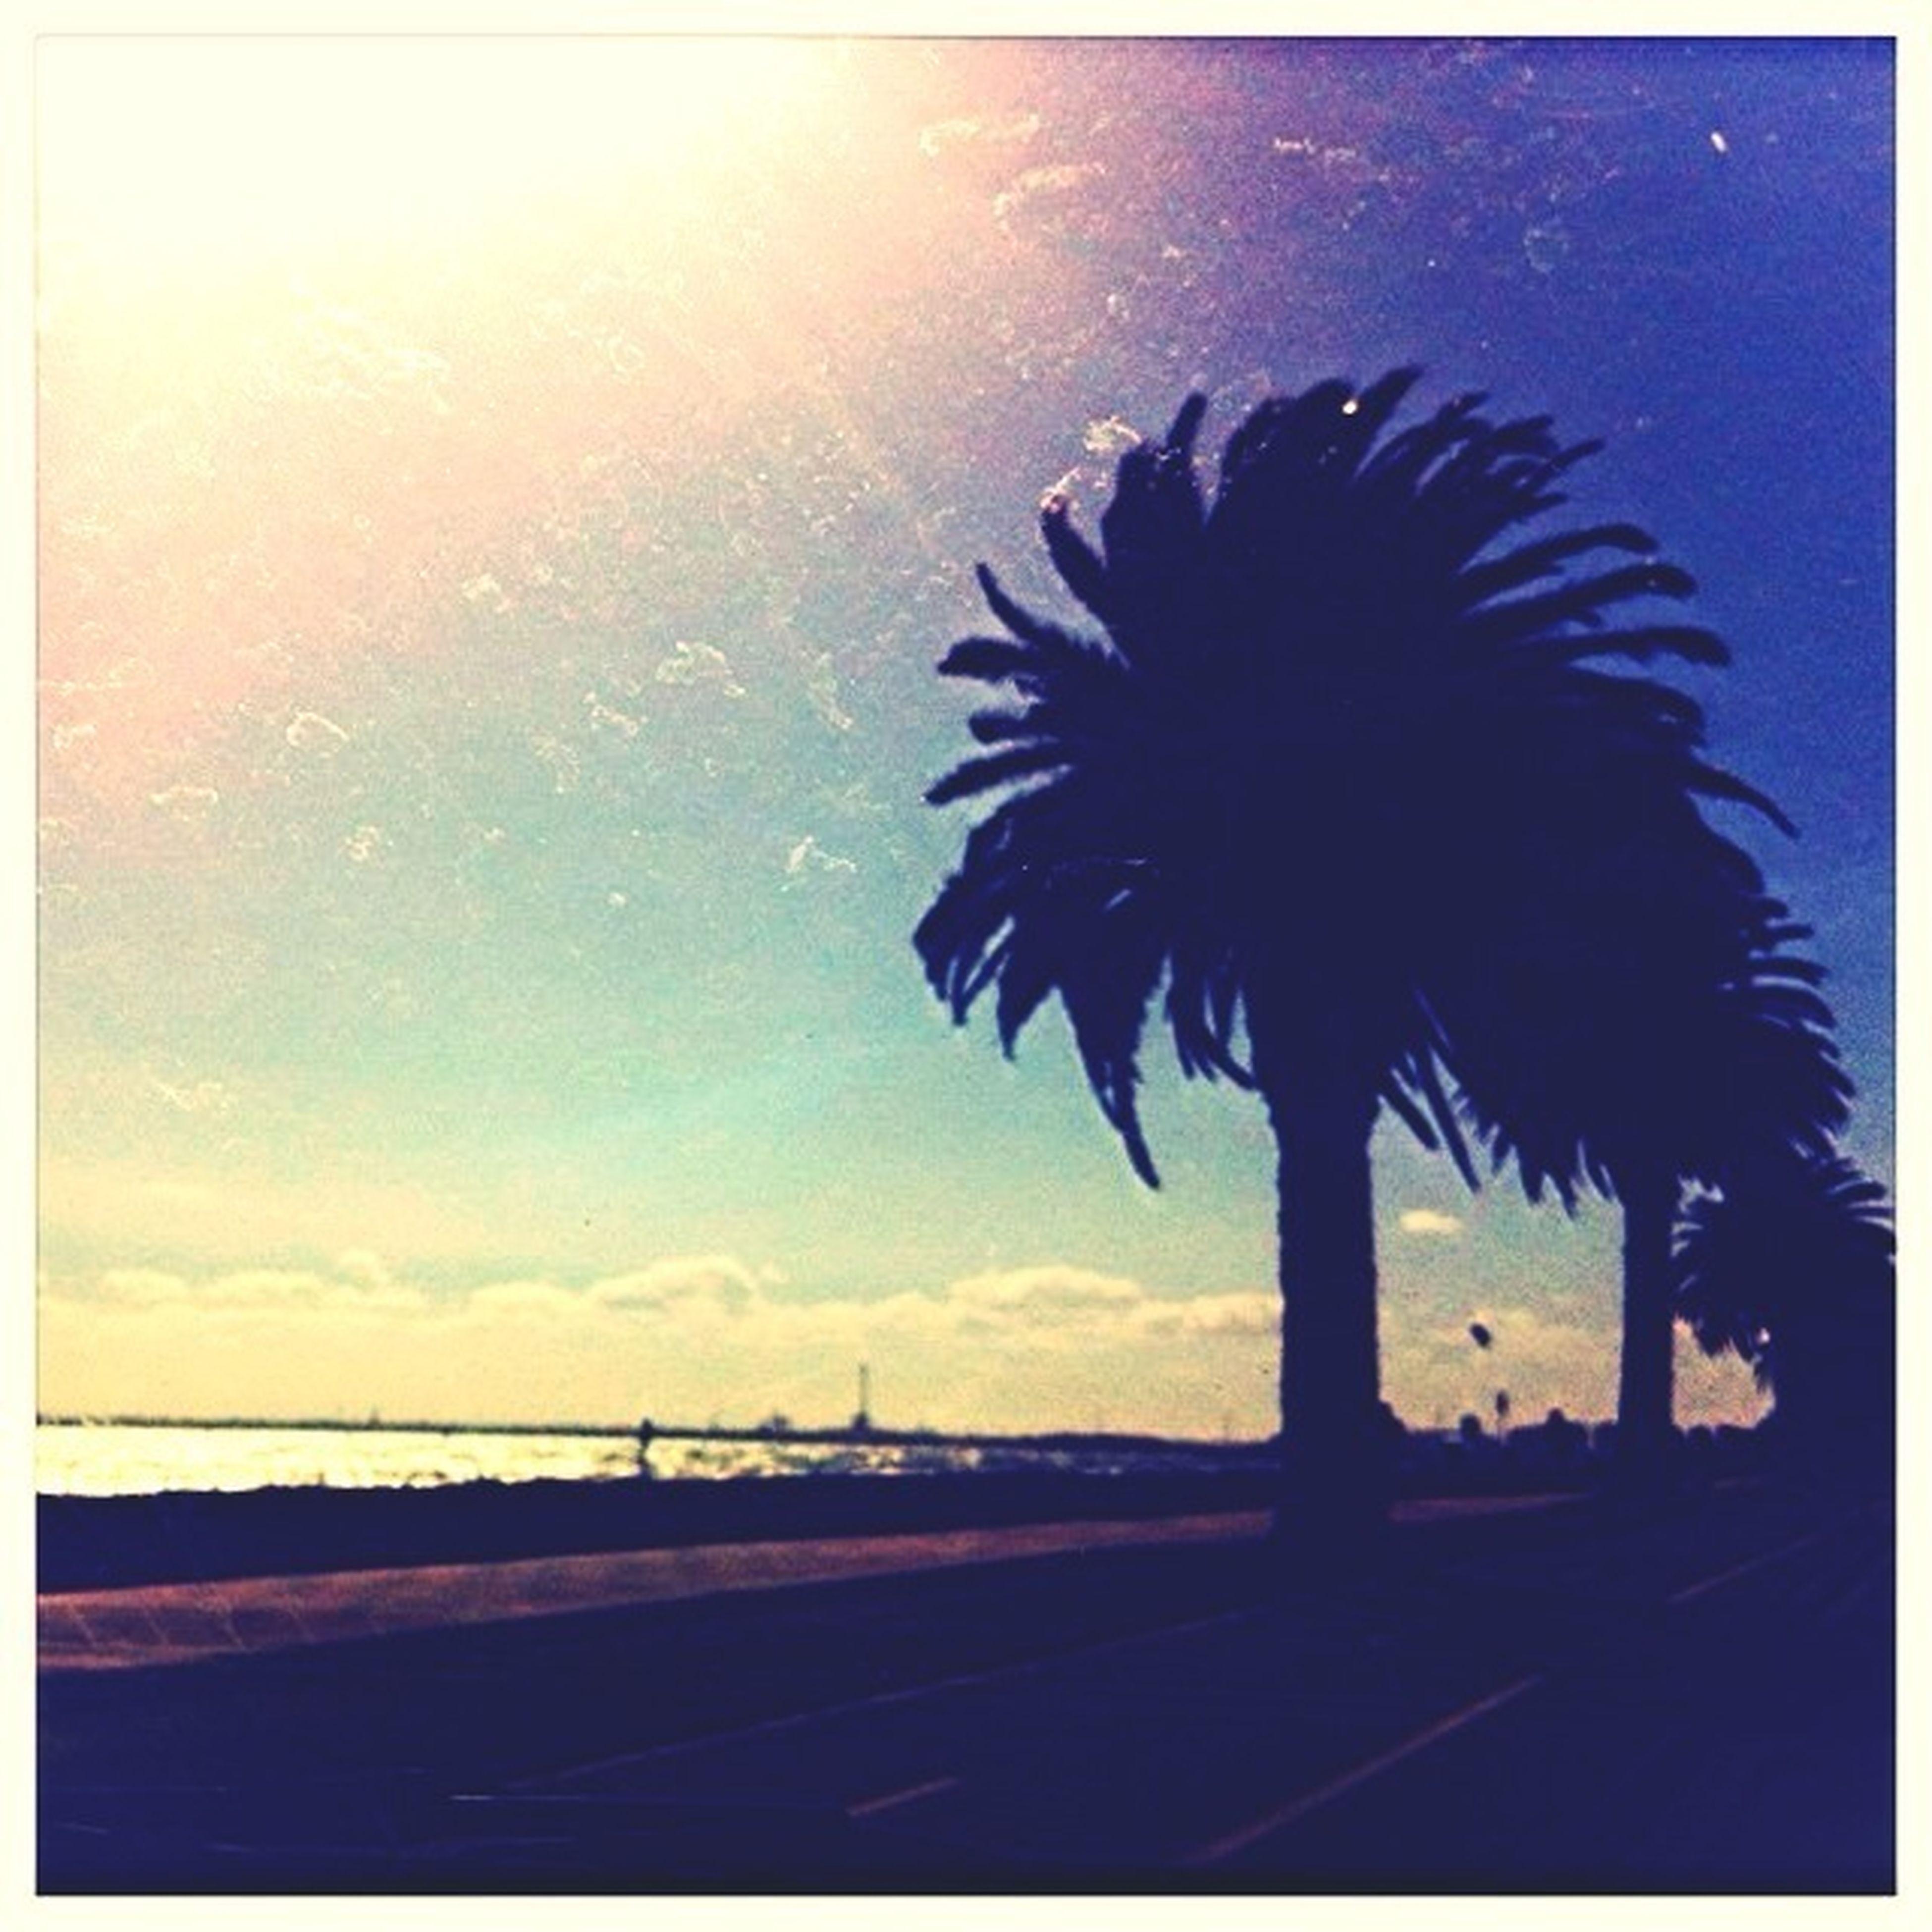 palm tree, sun, sea, silhouette, sunset, water, tranquility, beauty in nature, tranquil scene, sky, horizon over water, scenics, beach, nature, sunlight, sunbeam, idyllic, shore, auto post production filter, tree